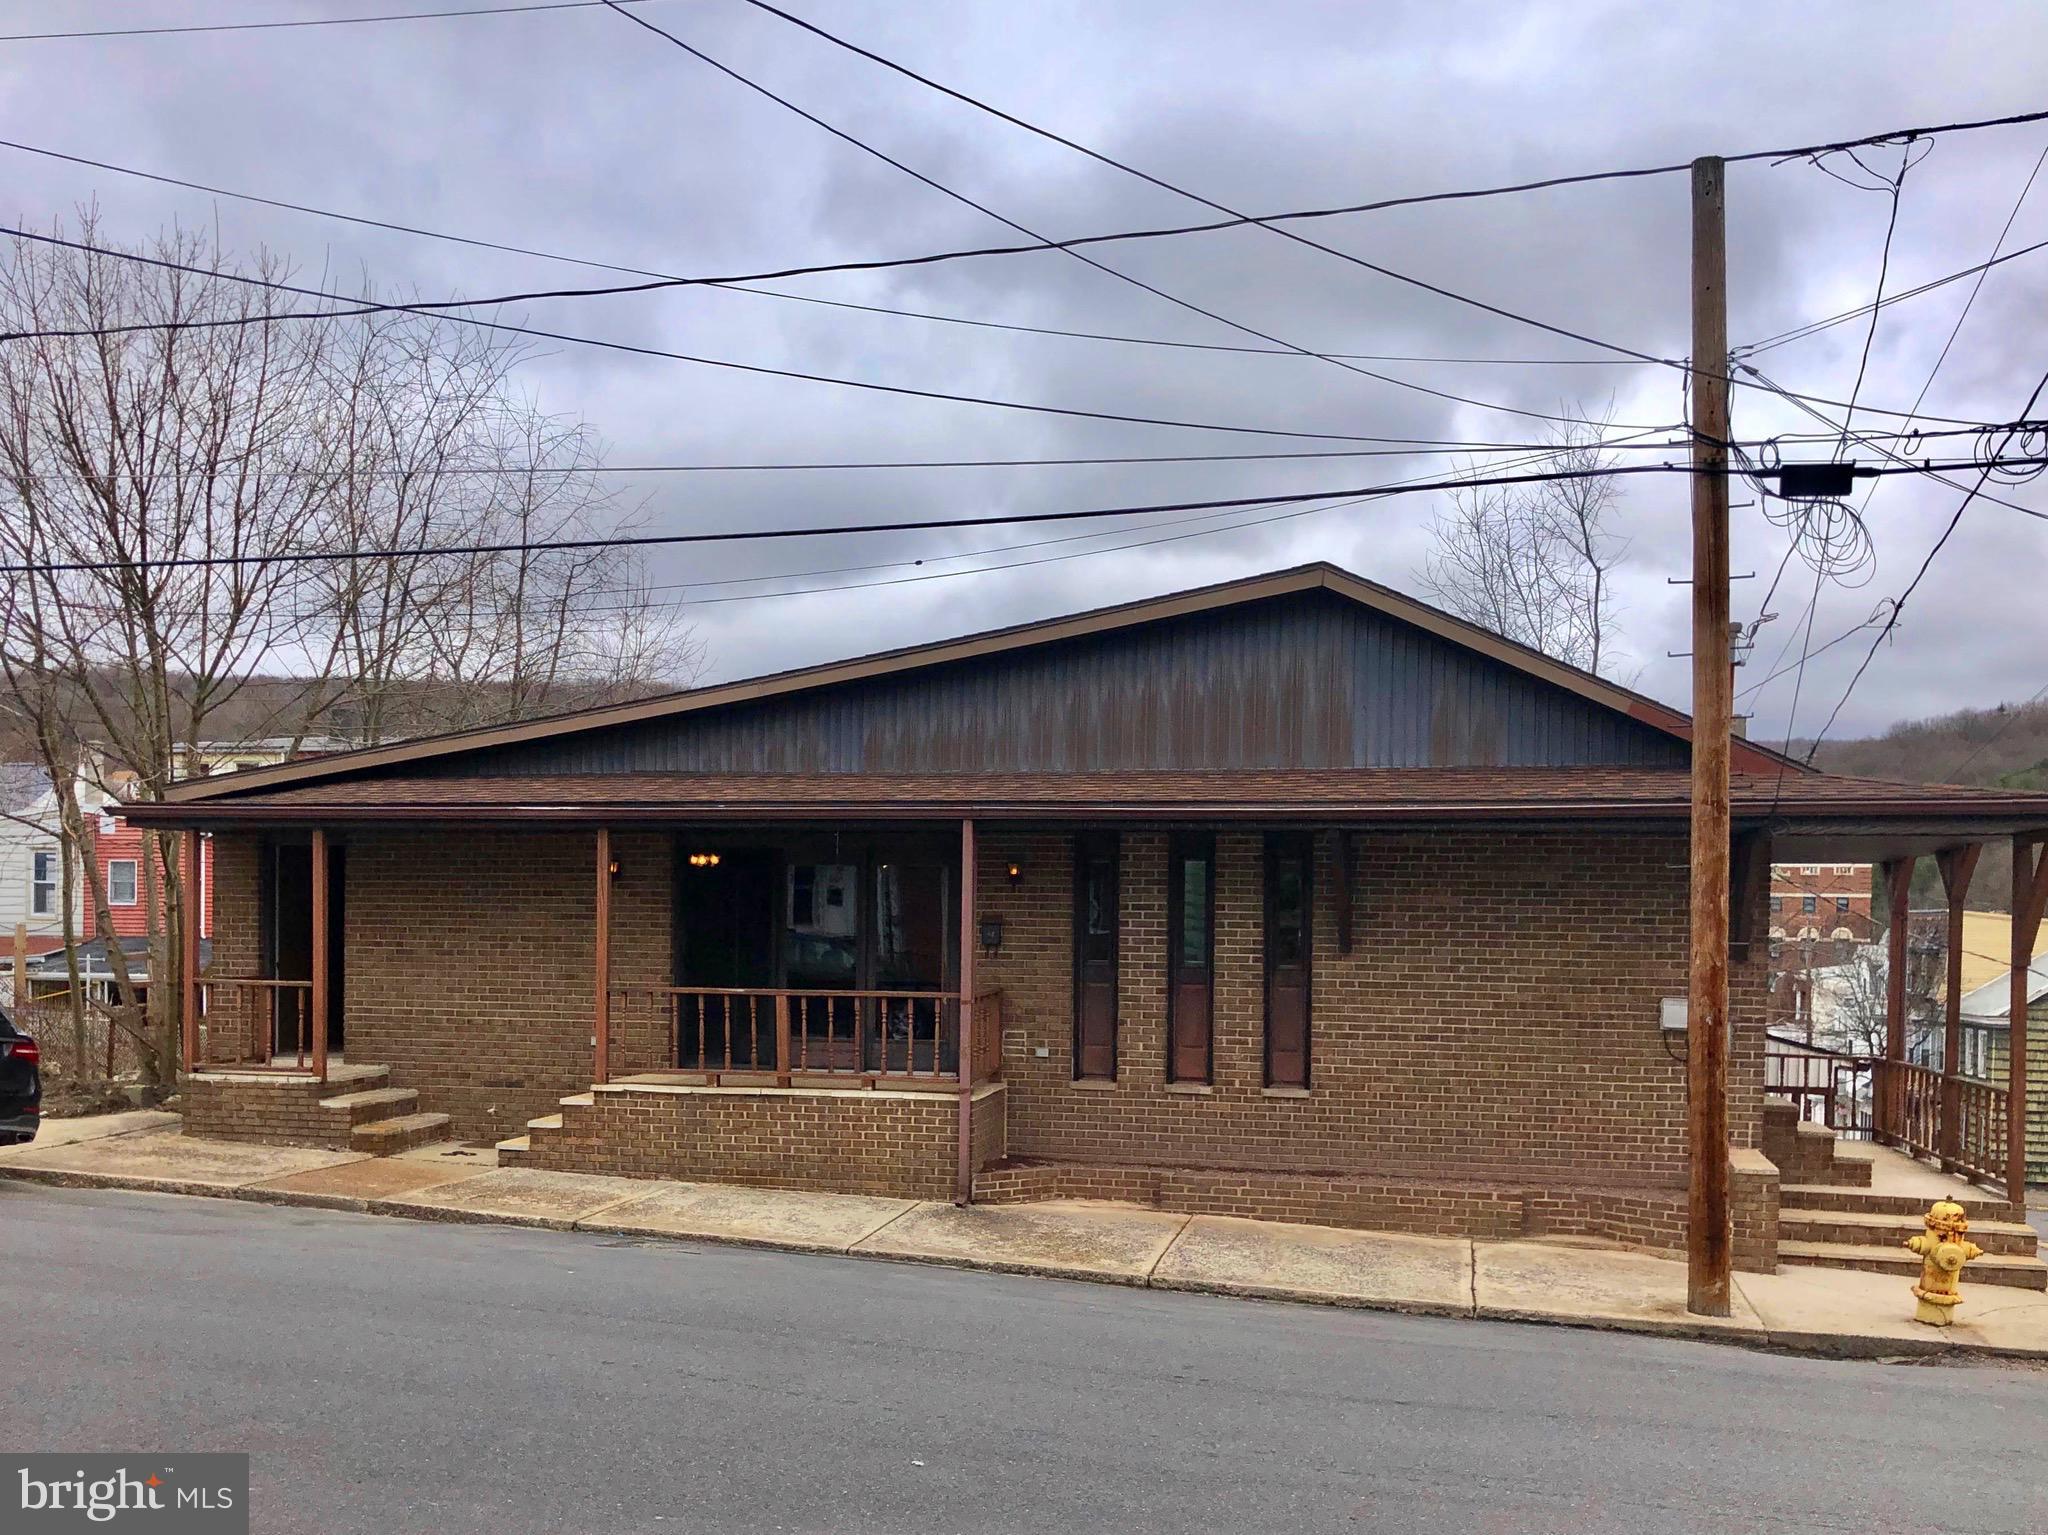 118 S 9Th Street, Ashland, PA 17921